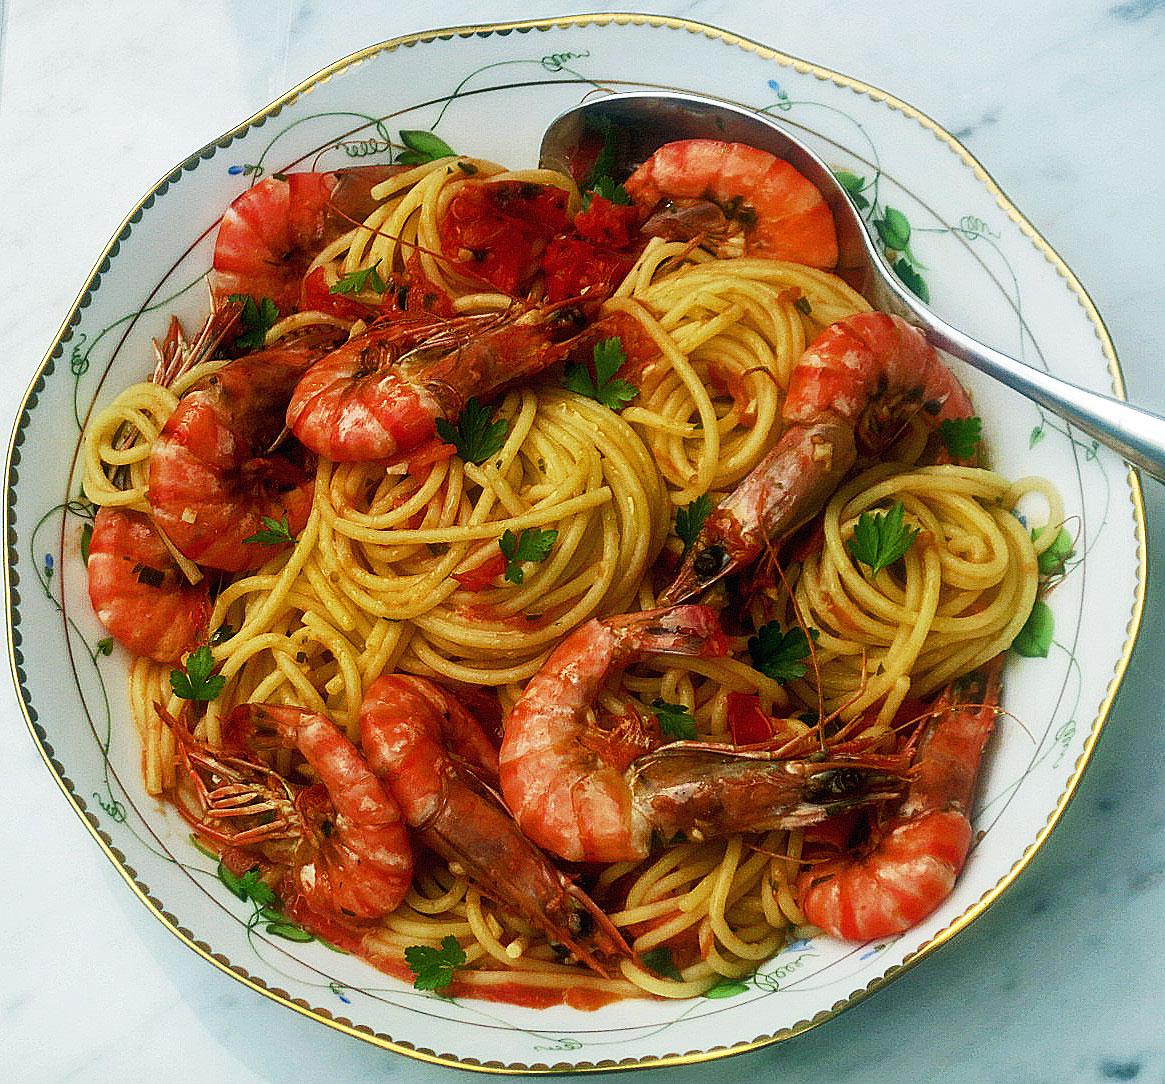 Spaghetti agli scampi (prawns)